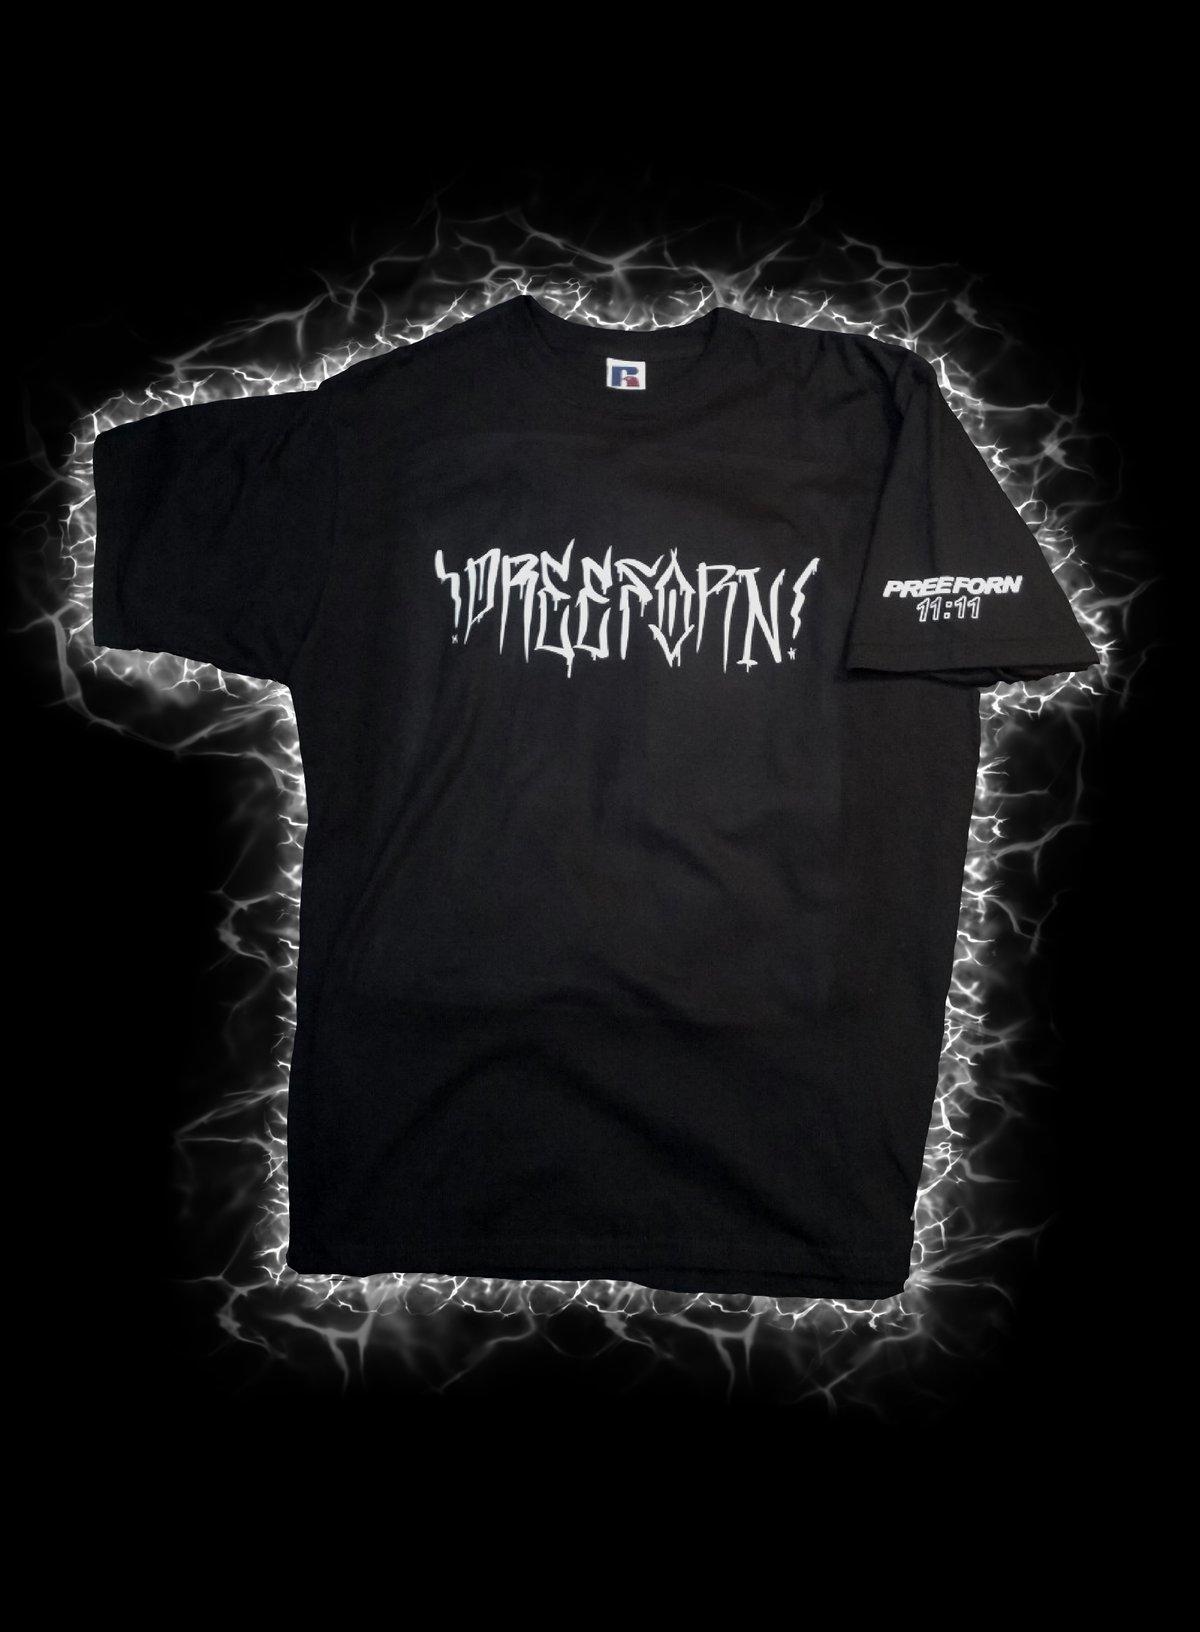 Image of PREEFORN 11;11 MK ultra, a clockwork orange t-shirt